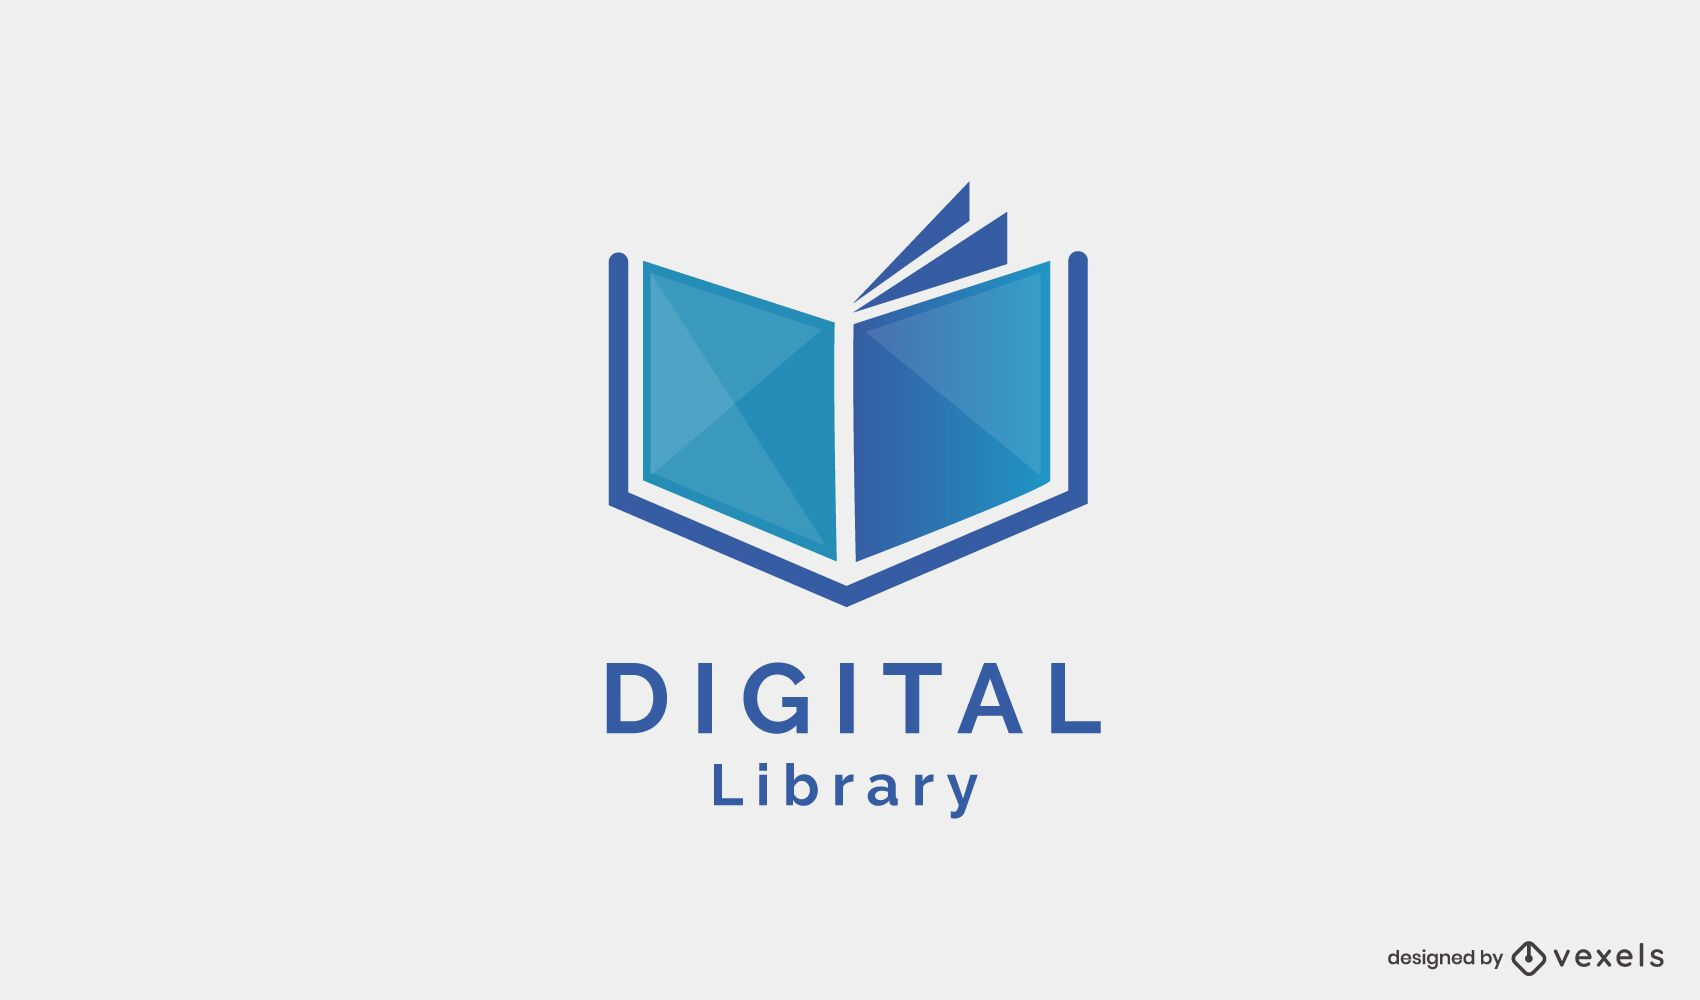 Digital Library Logo Design